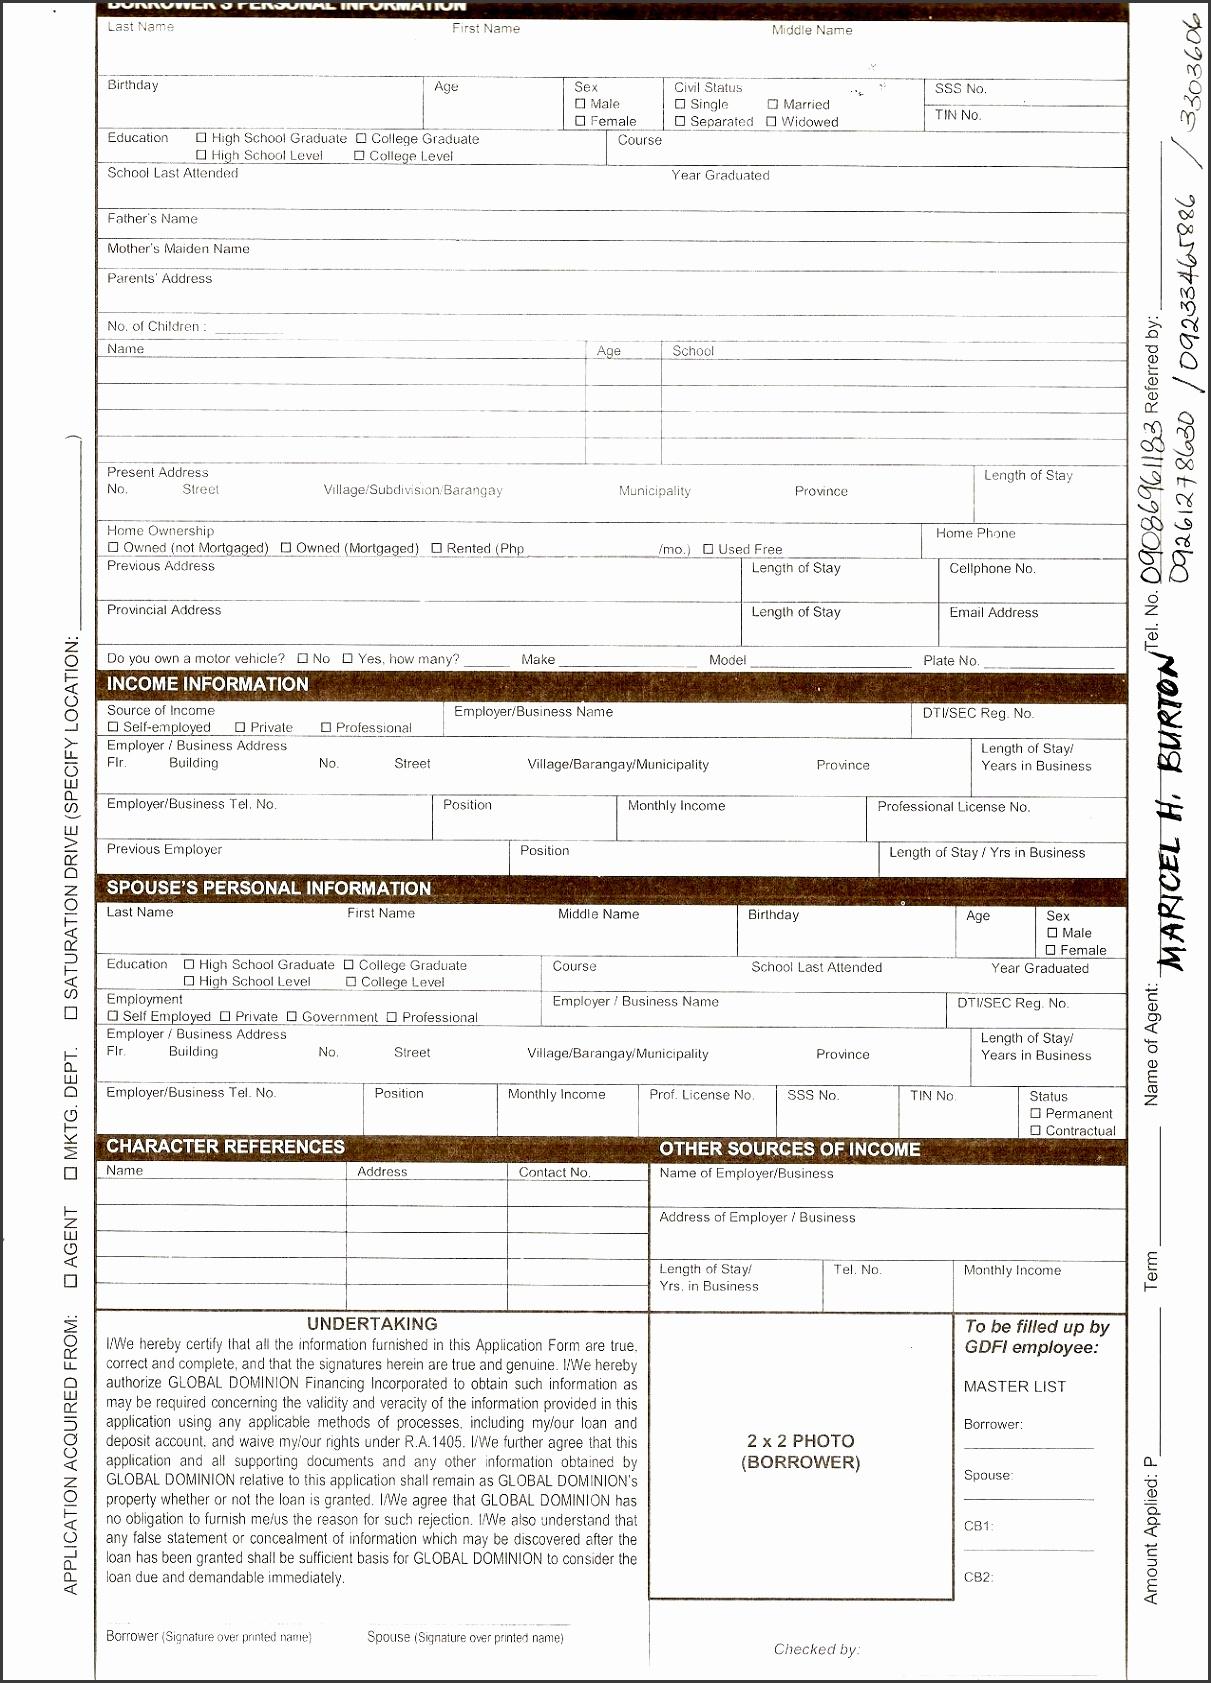 auto loan contract template eliolera auto loan contract template eliolera for free auto loan agreement form